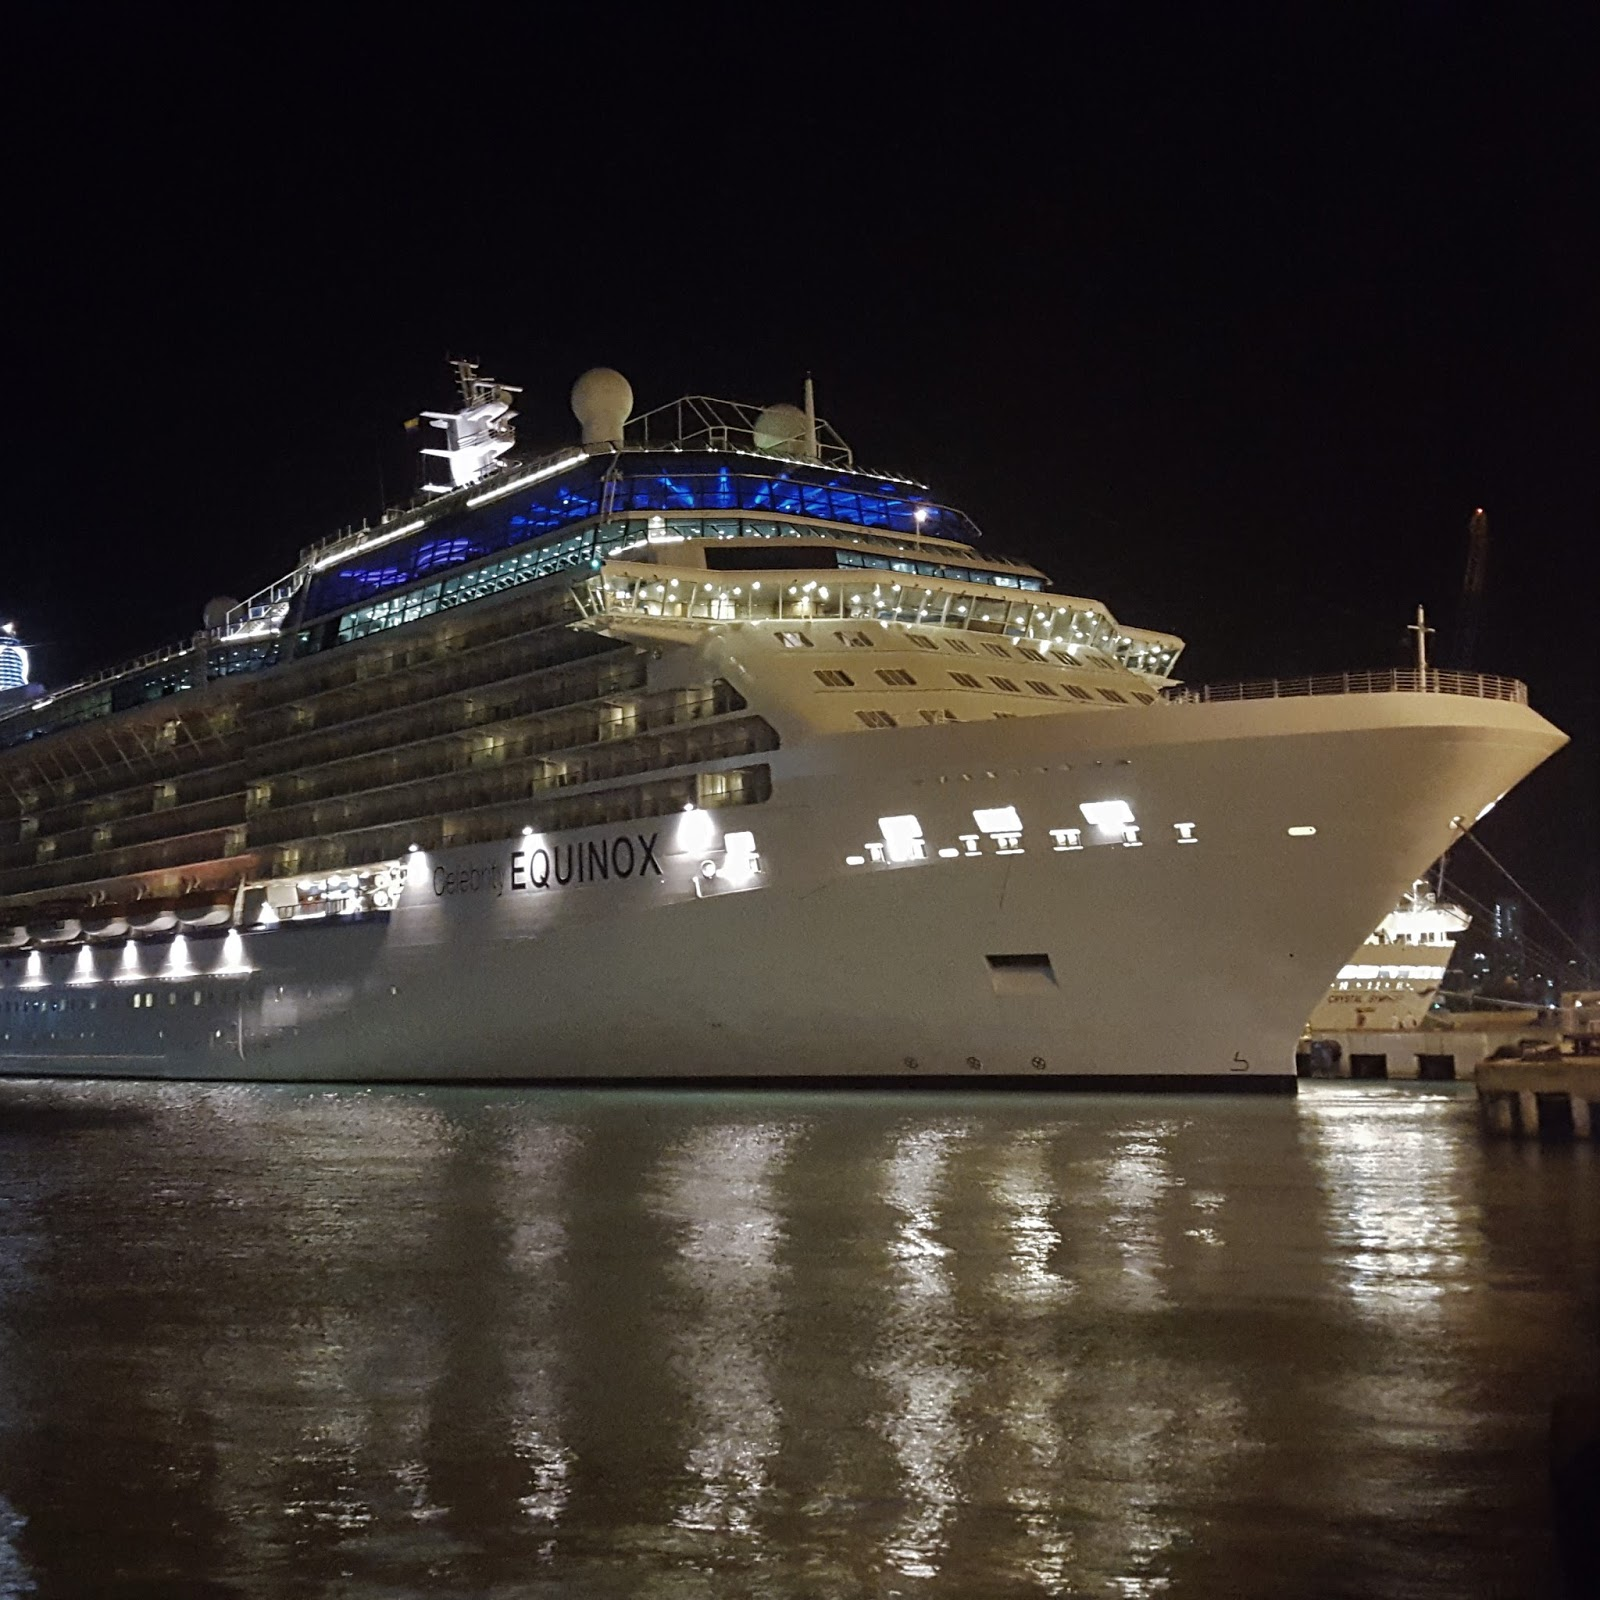 celebrity dress code help - Celebrity Cruises - Cruise ...